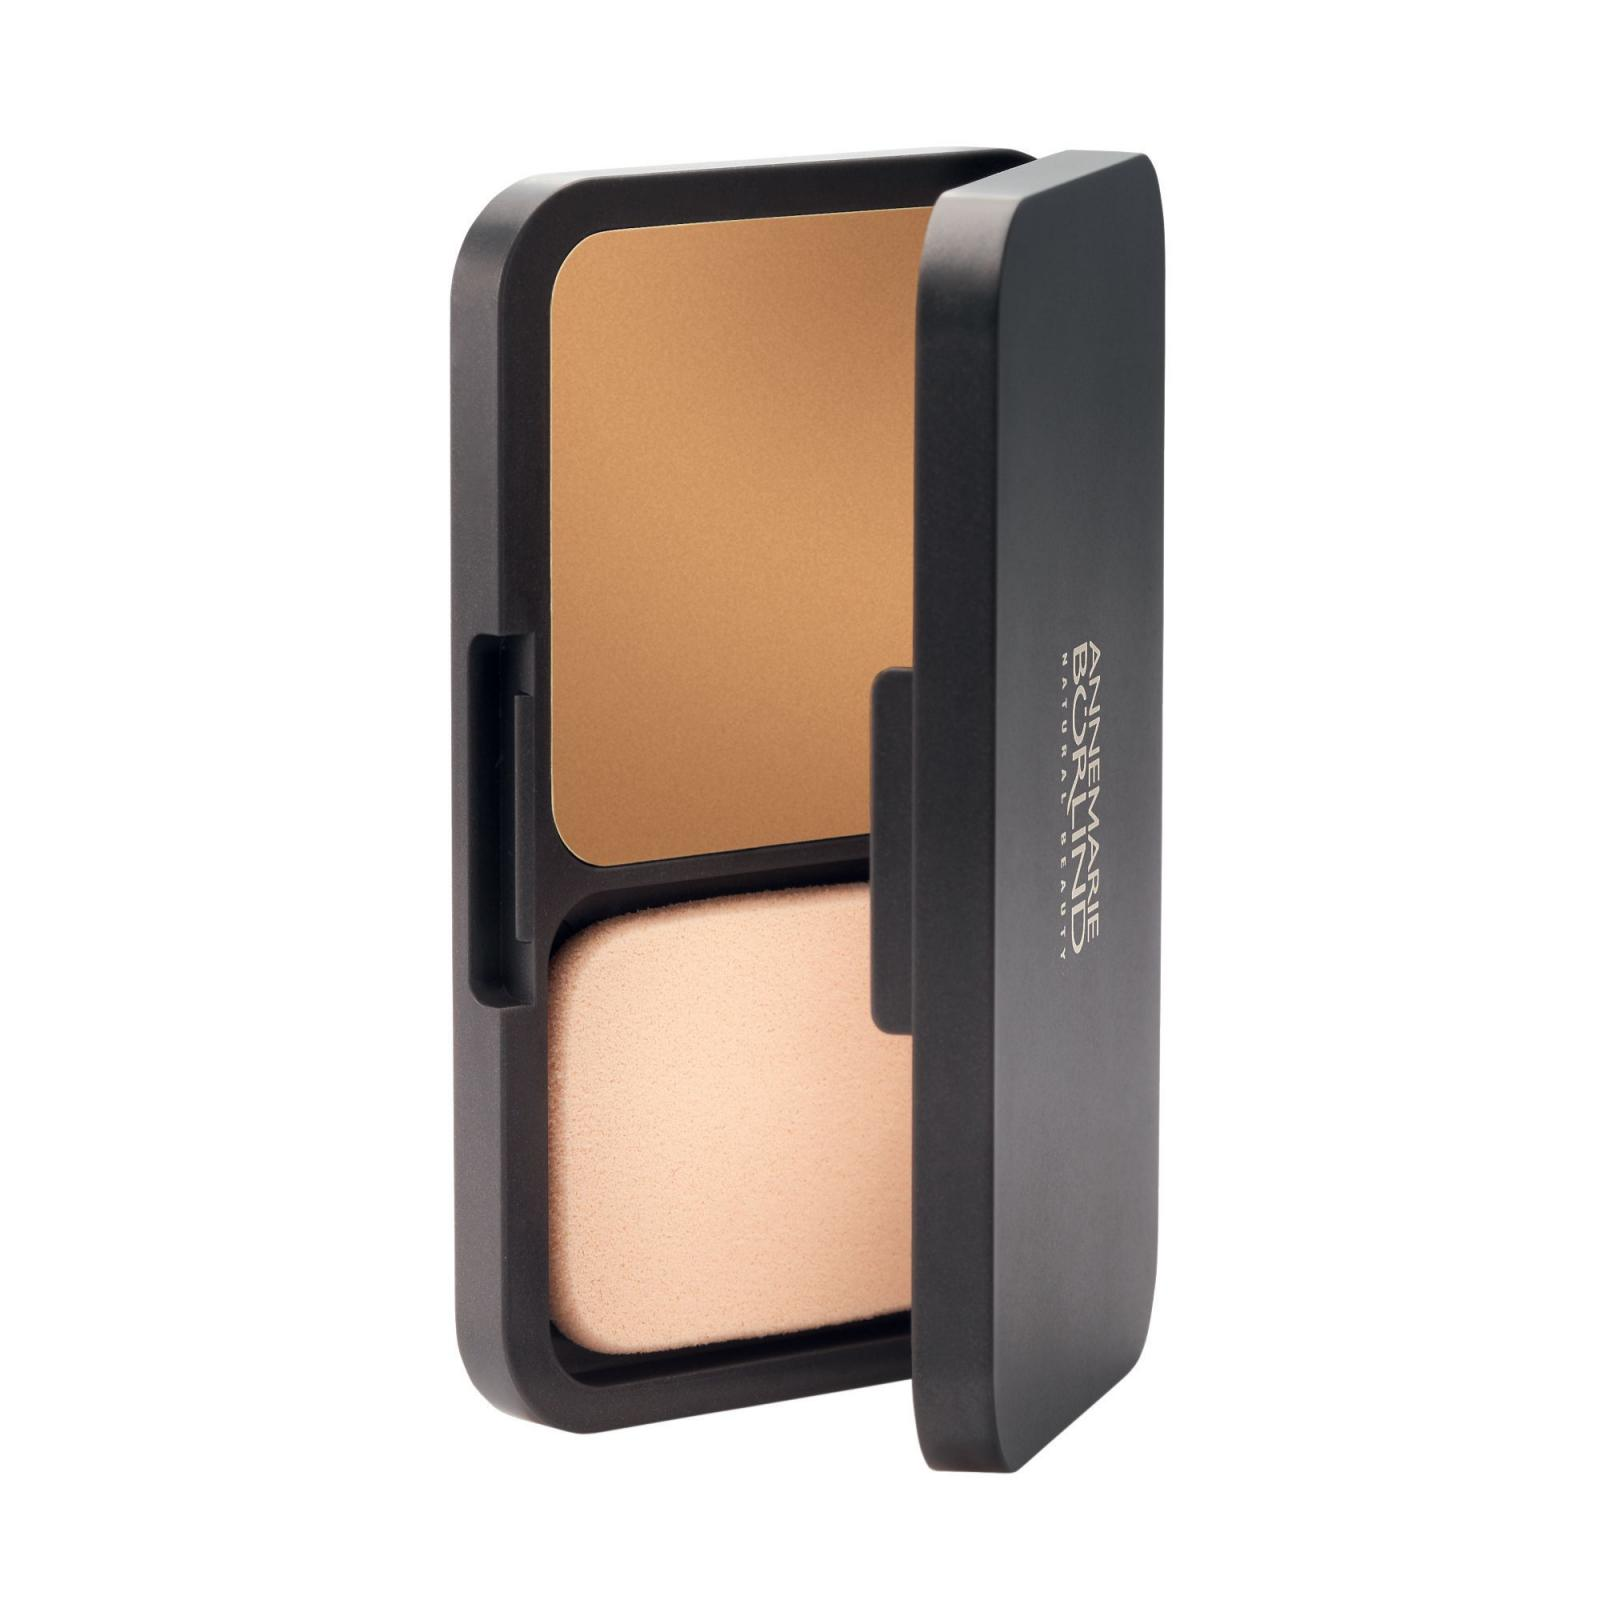 Annemarie Börlind Kompaktní make-up Hazel 10 g